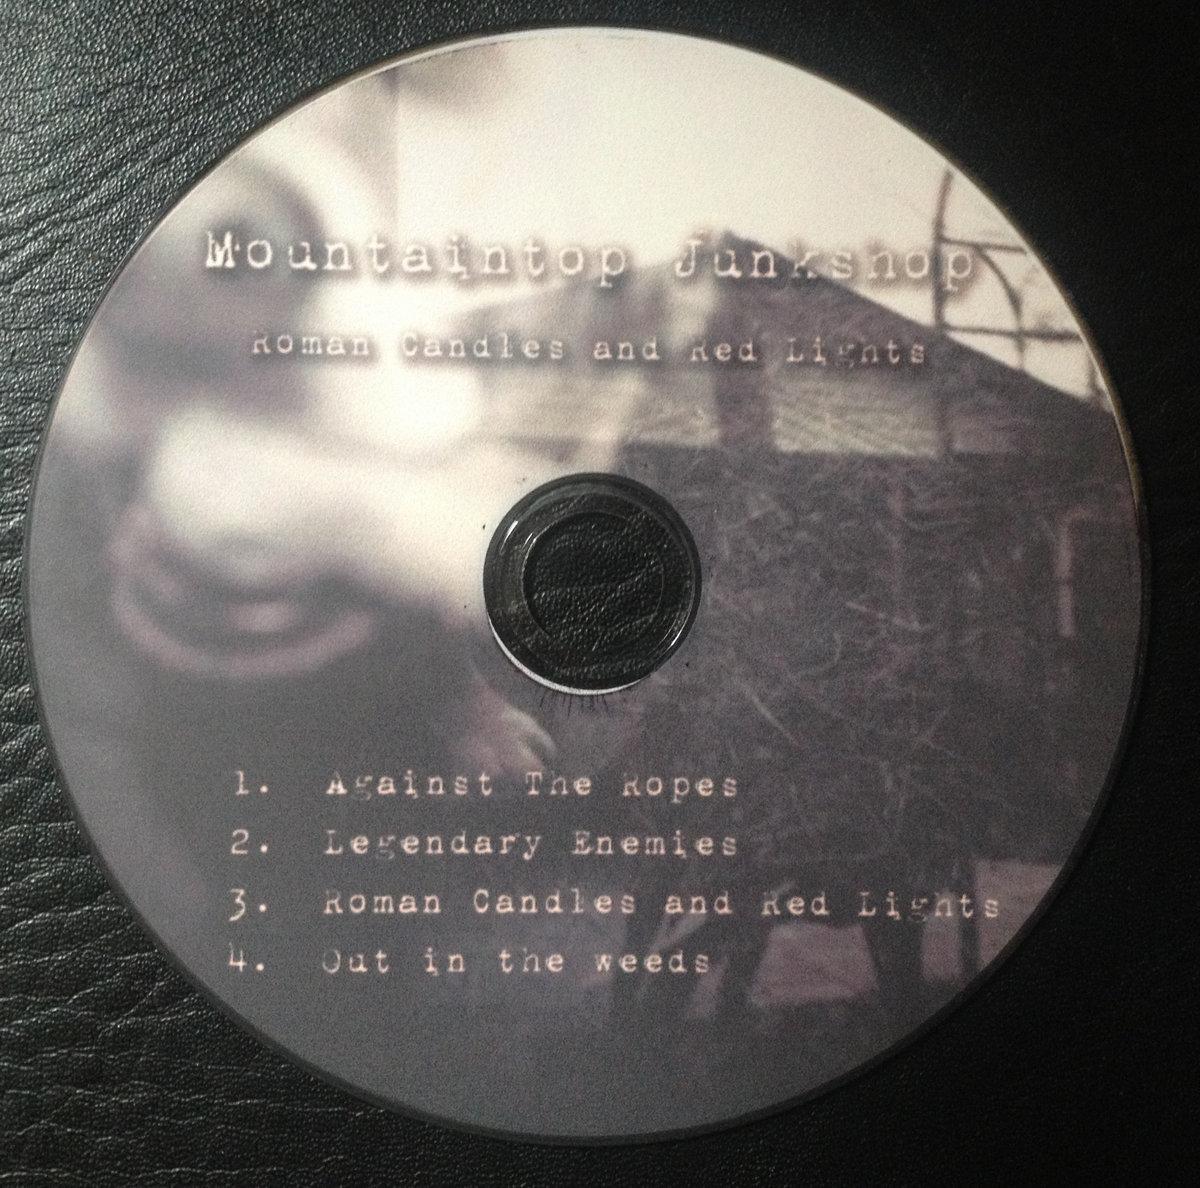 Roman Candles and Red Lights EP | MOUNTAINTOP JUNKSHOP